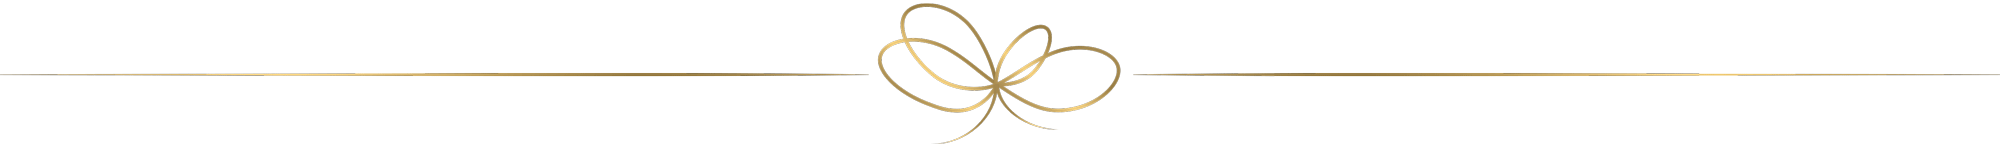 Bow Line Divider